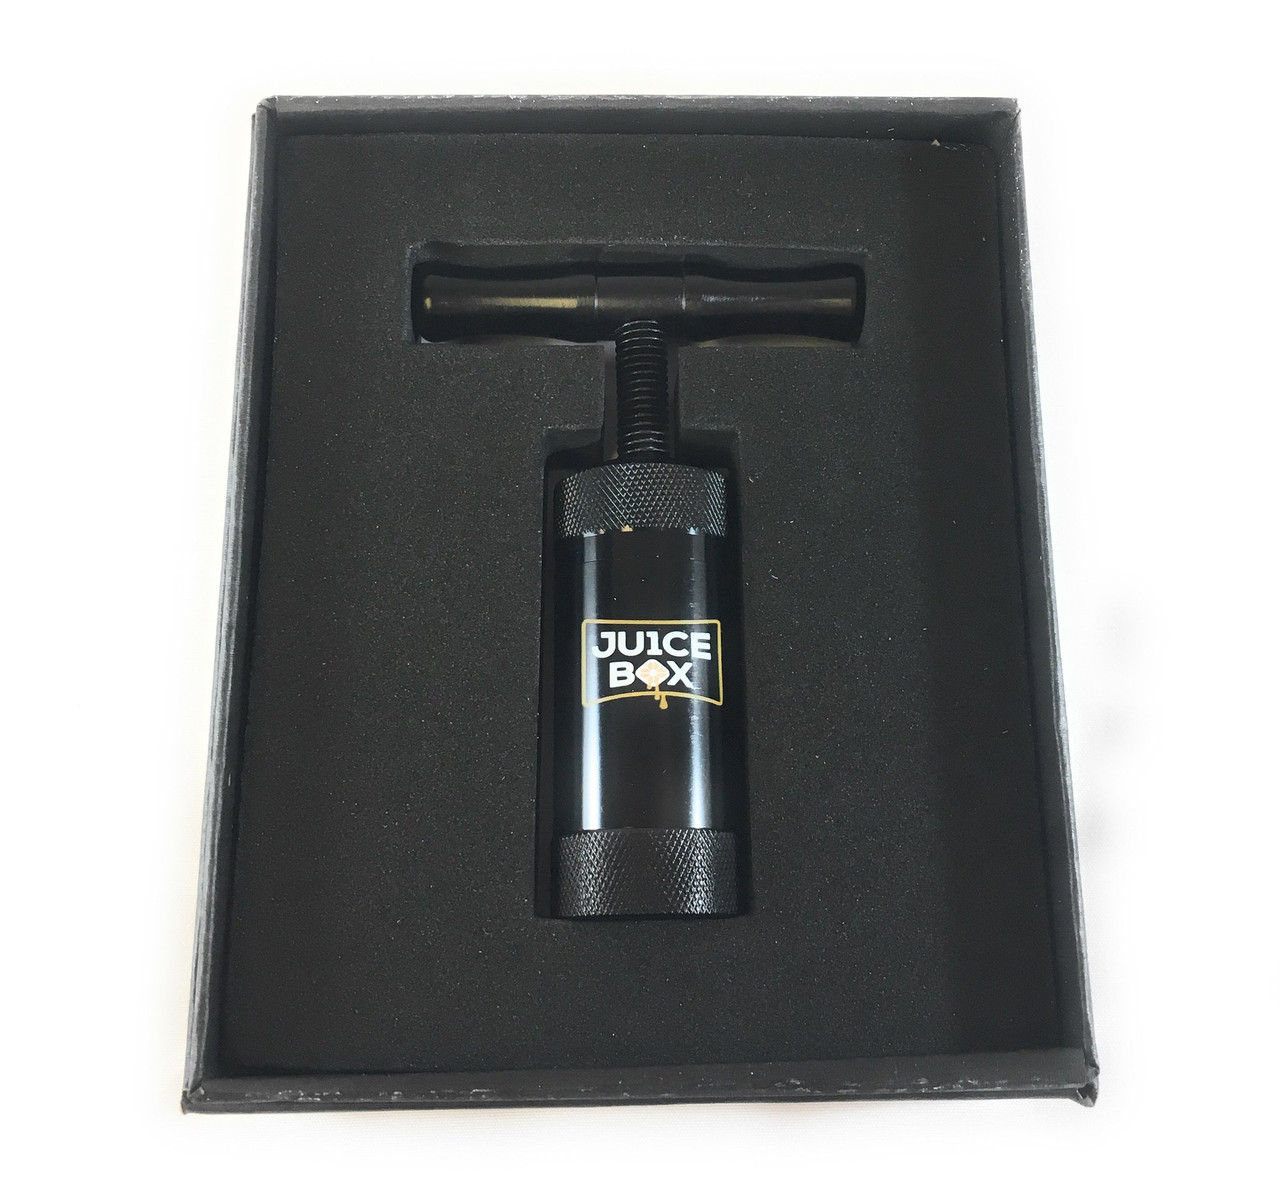 Stainless Steel Pre-Press (Pollen Press) (Ju1ce Box)